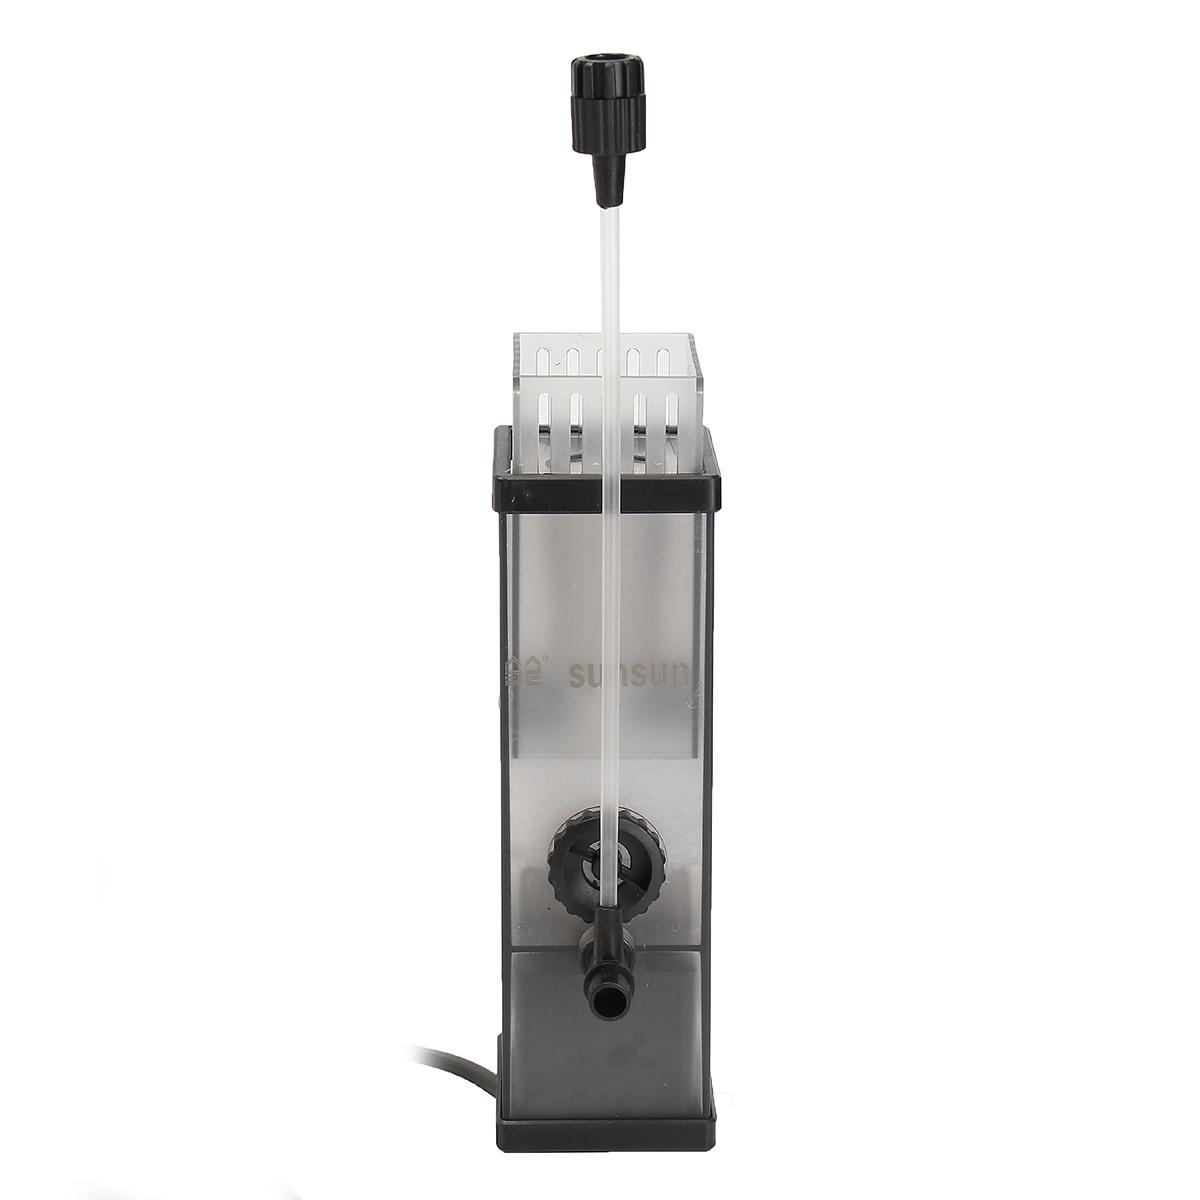 SUNSUN 5W 300L/H Surface Skimmer Aquarium Filter 450 L Pump Plant Freswater Marine Oil